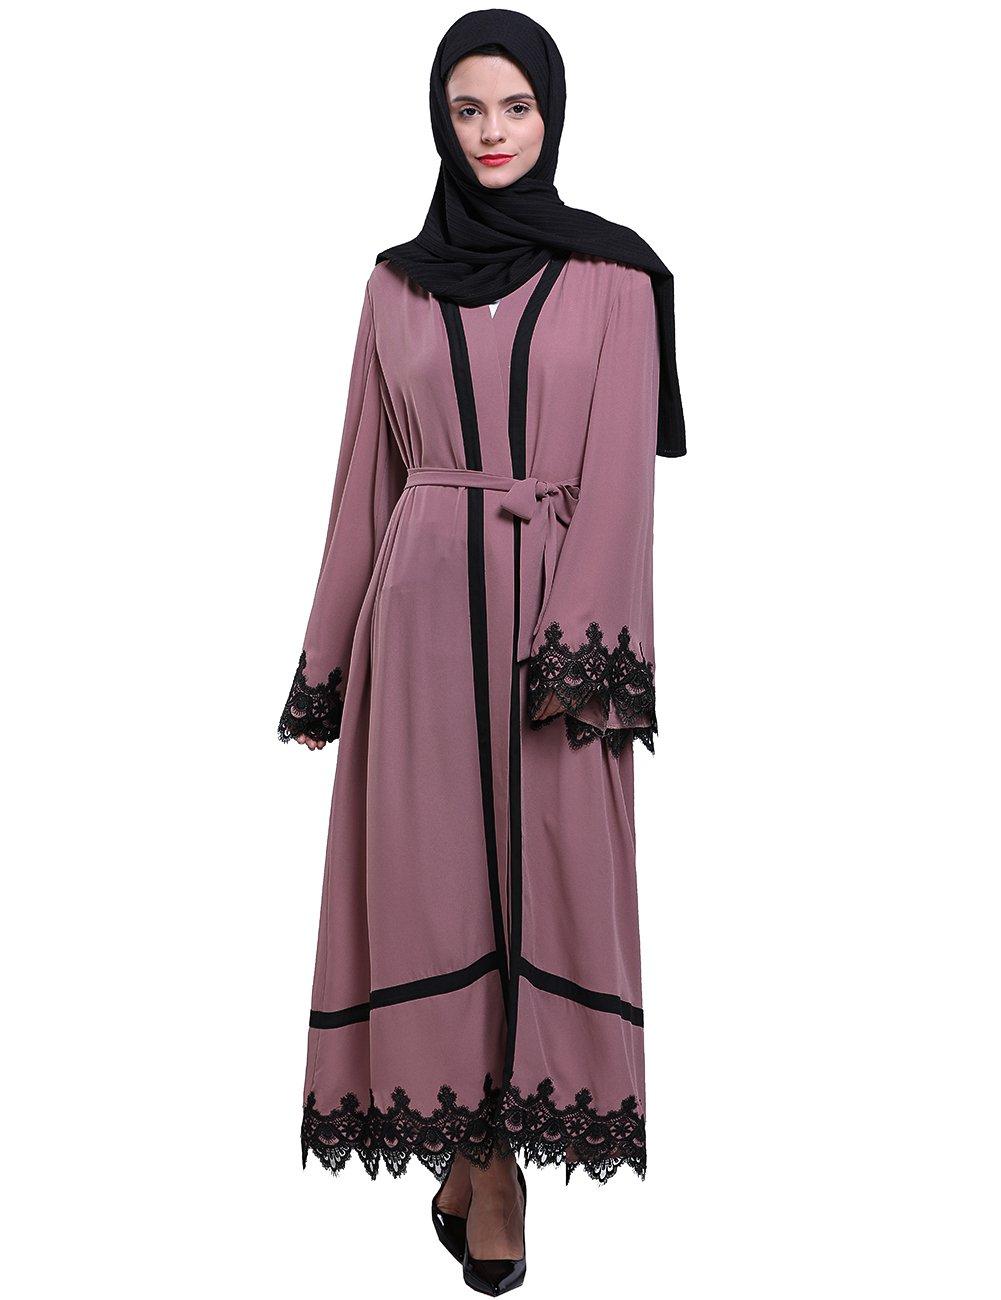 Fancyqube Women's Elegant Muslim Kaftan Dubai Islamic Abayas Long Sleeve A Line Maxi Dress FANCYQUBE0305